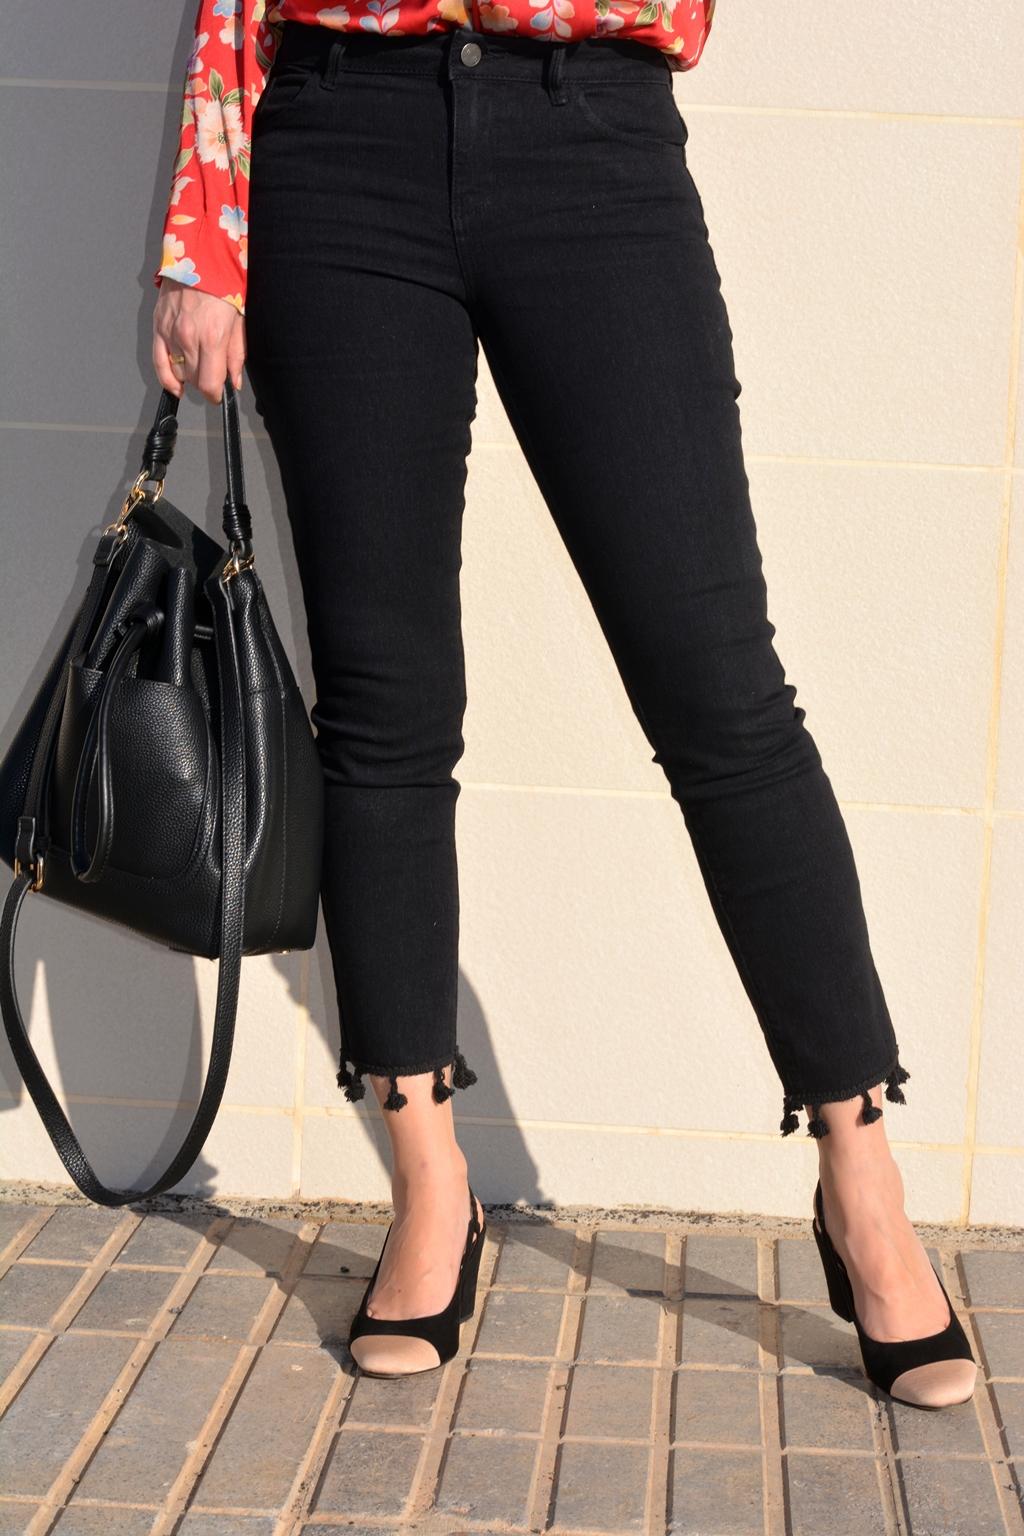 jeans-pompones-zapatos-tipo-chanel-mango